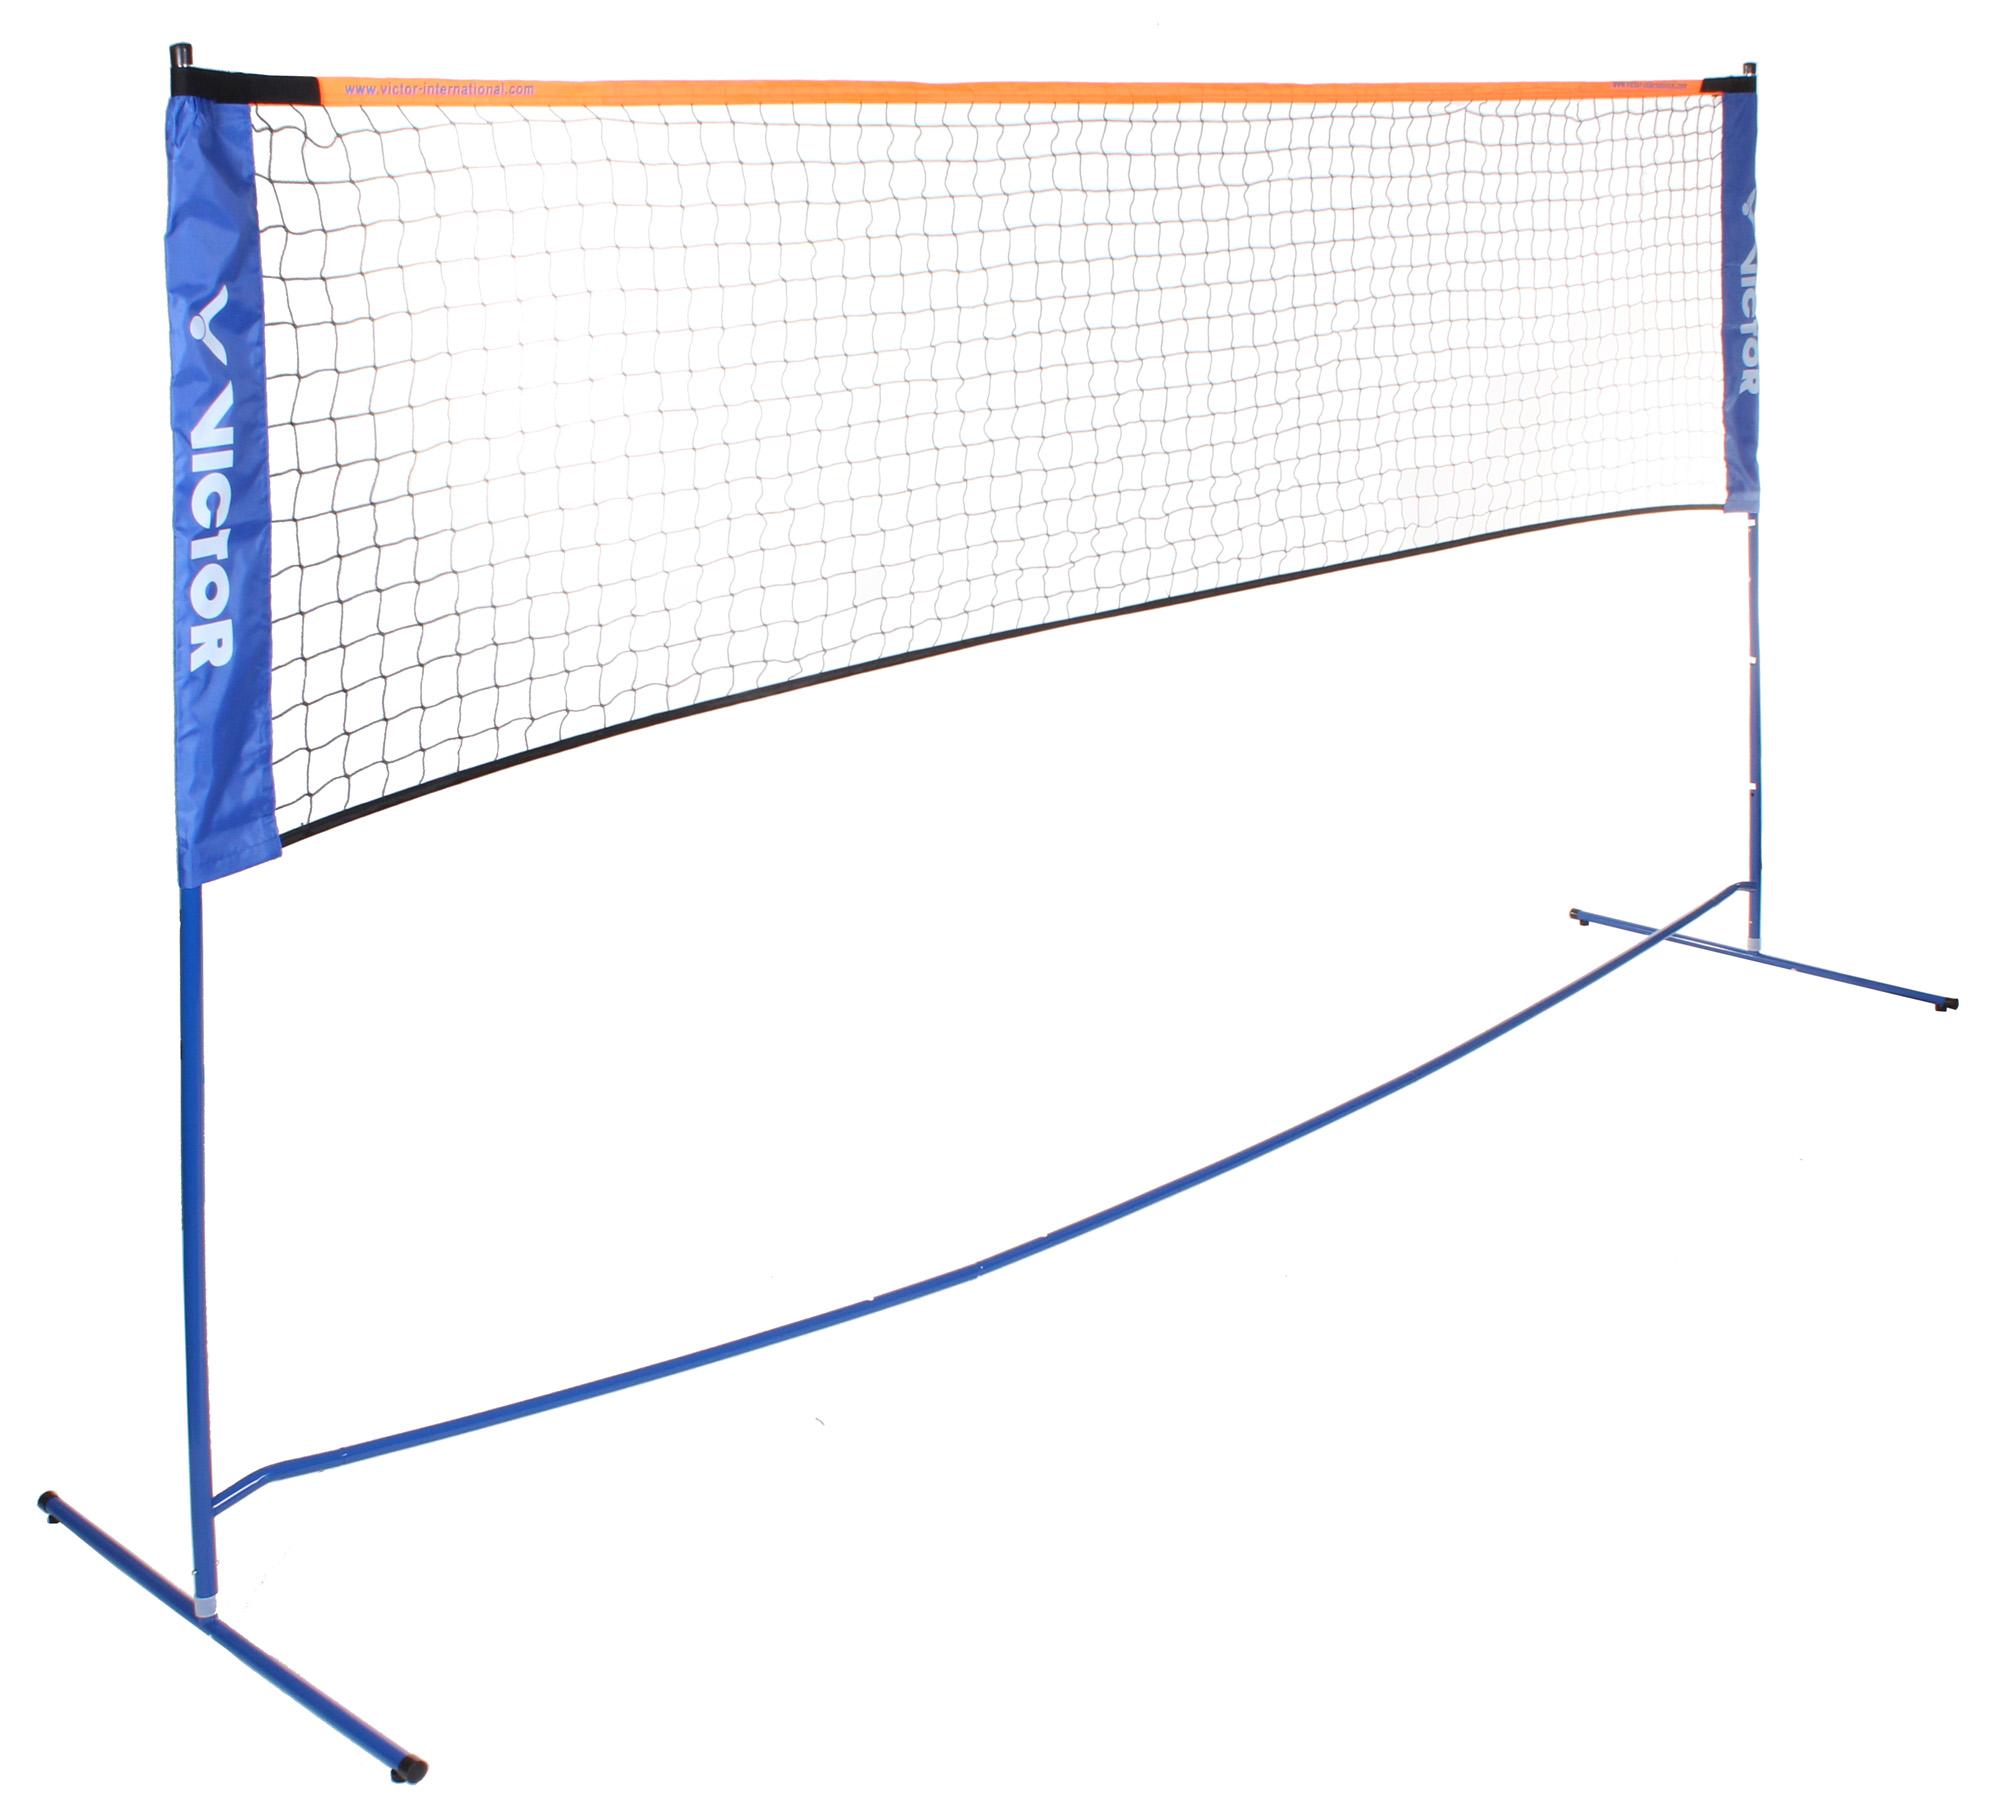 Fileu badminton Merco Advantage